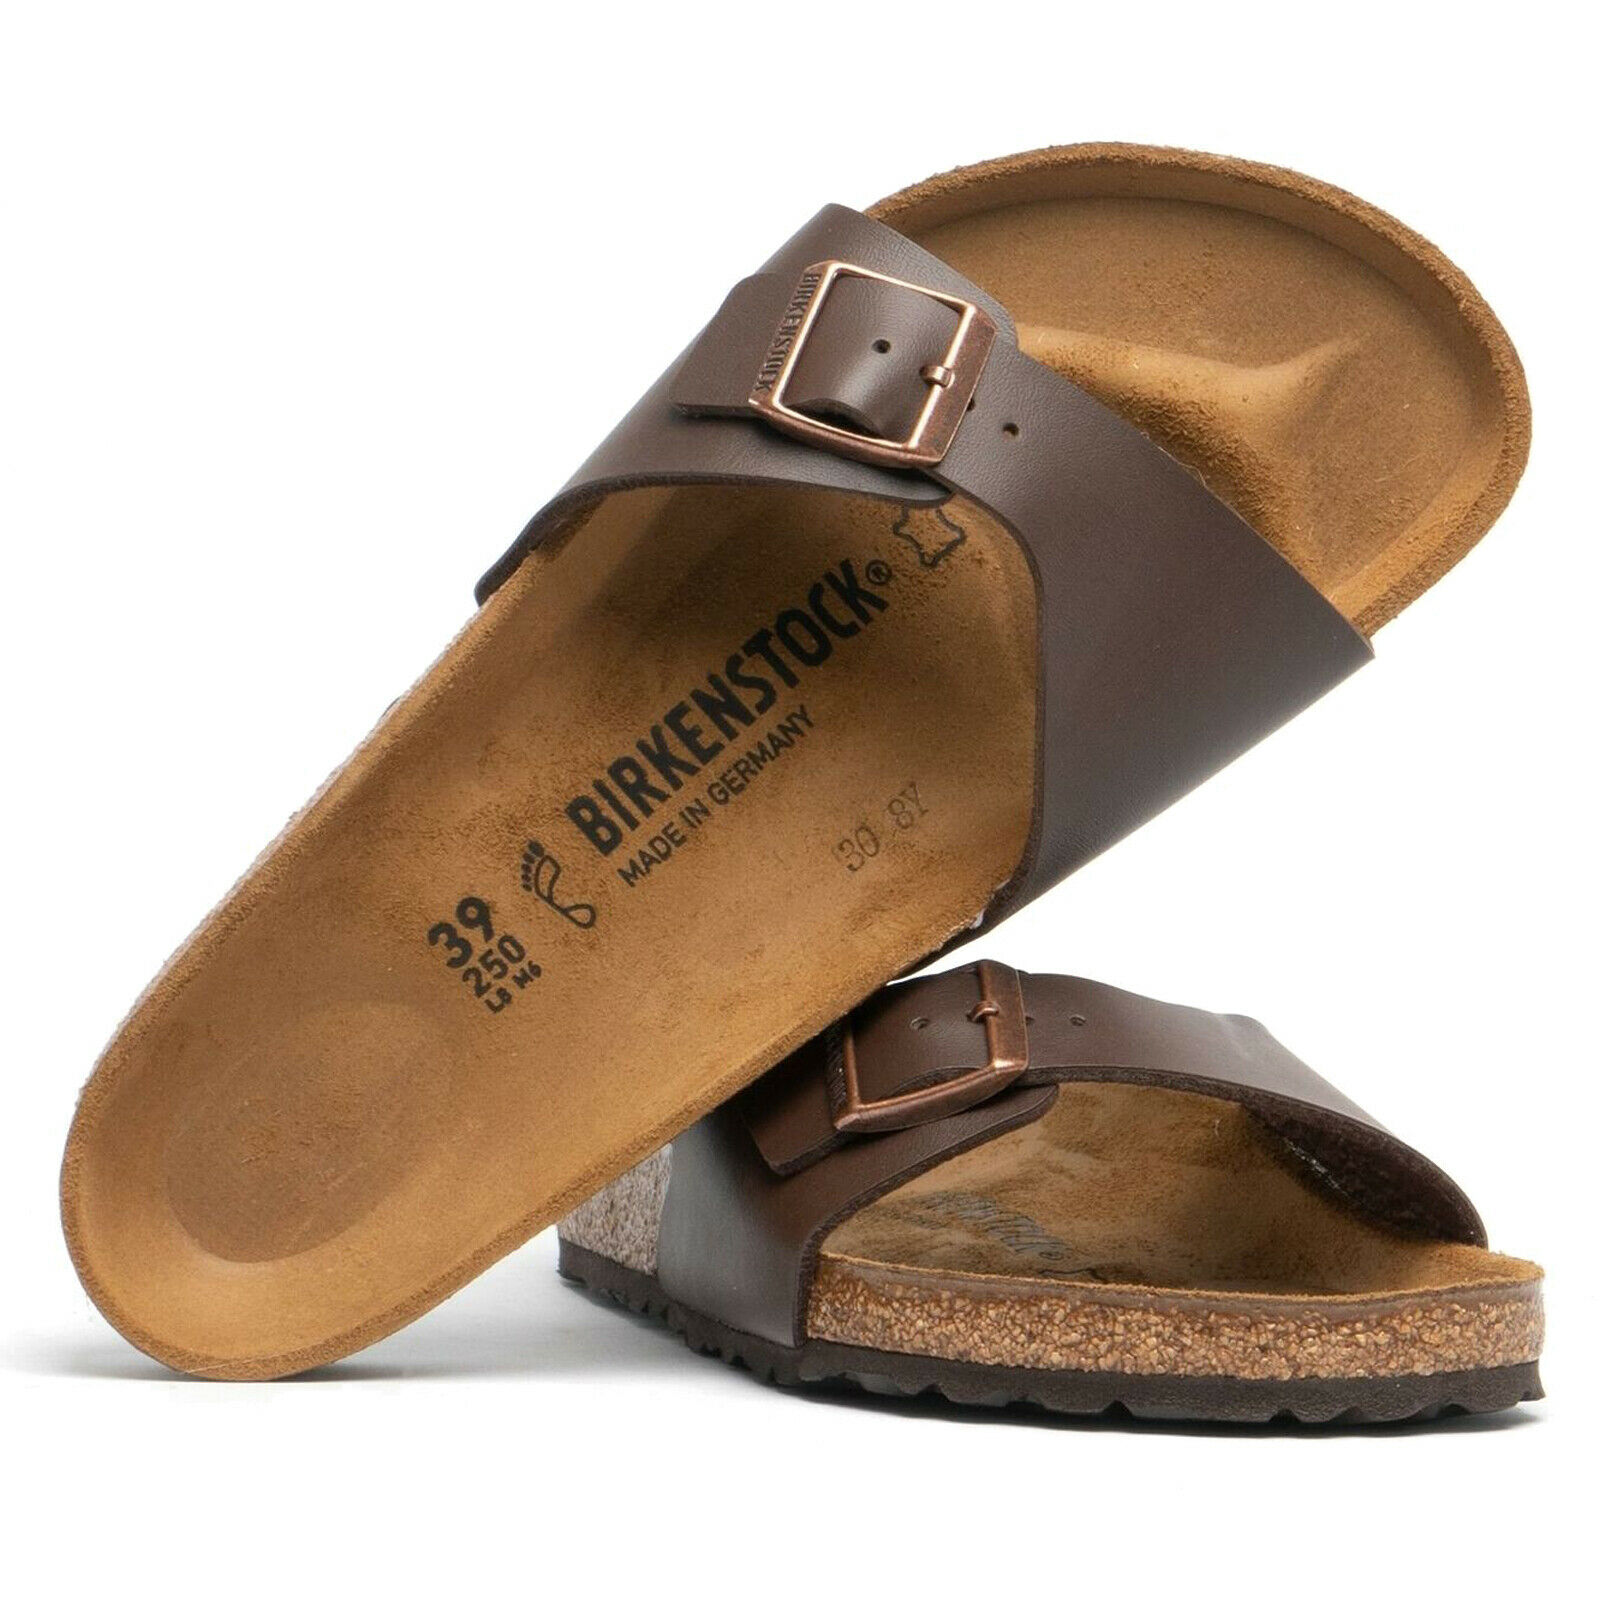 Birkenstock Unisex Sandals Madrid Mens Womens Summer Birko-Flor